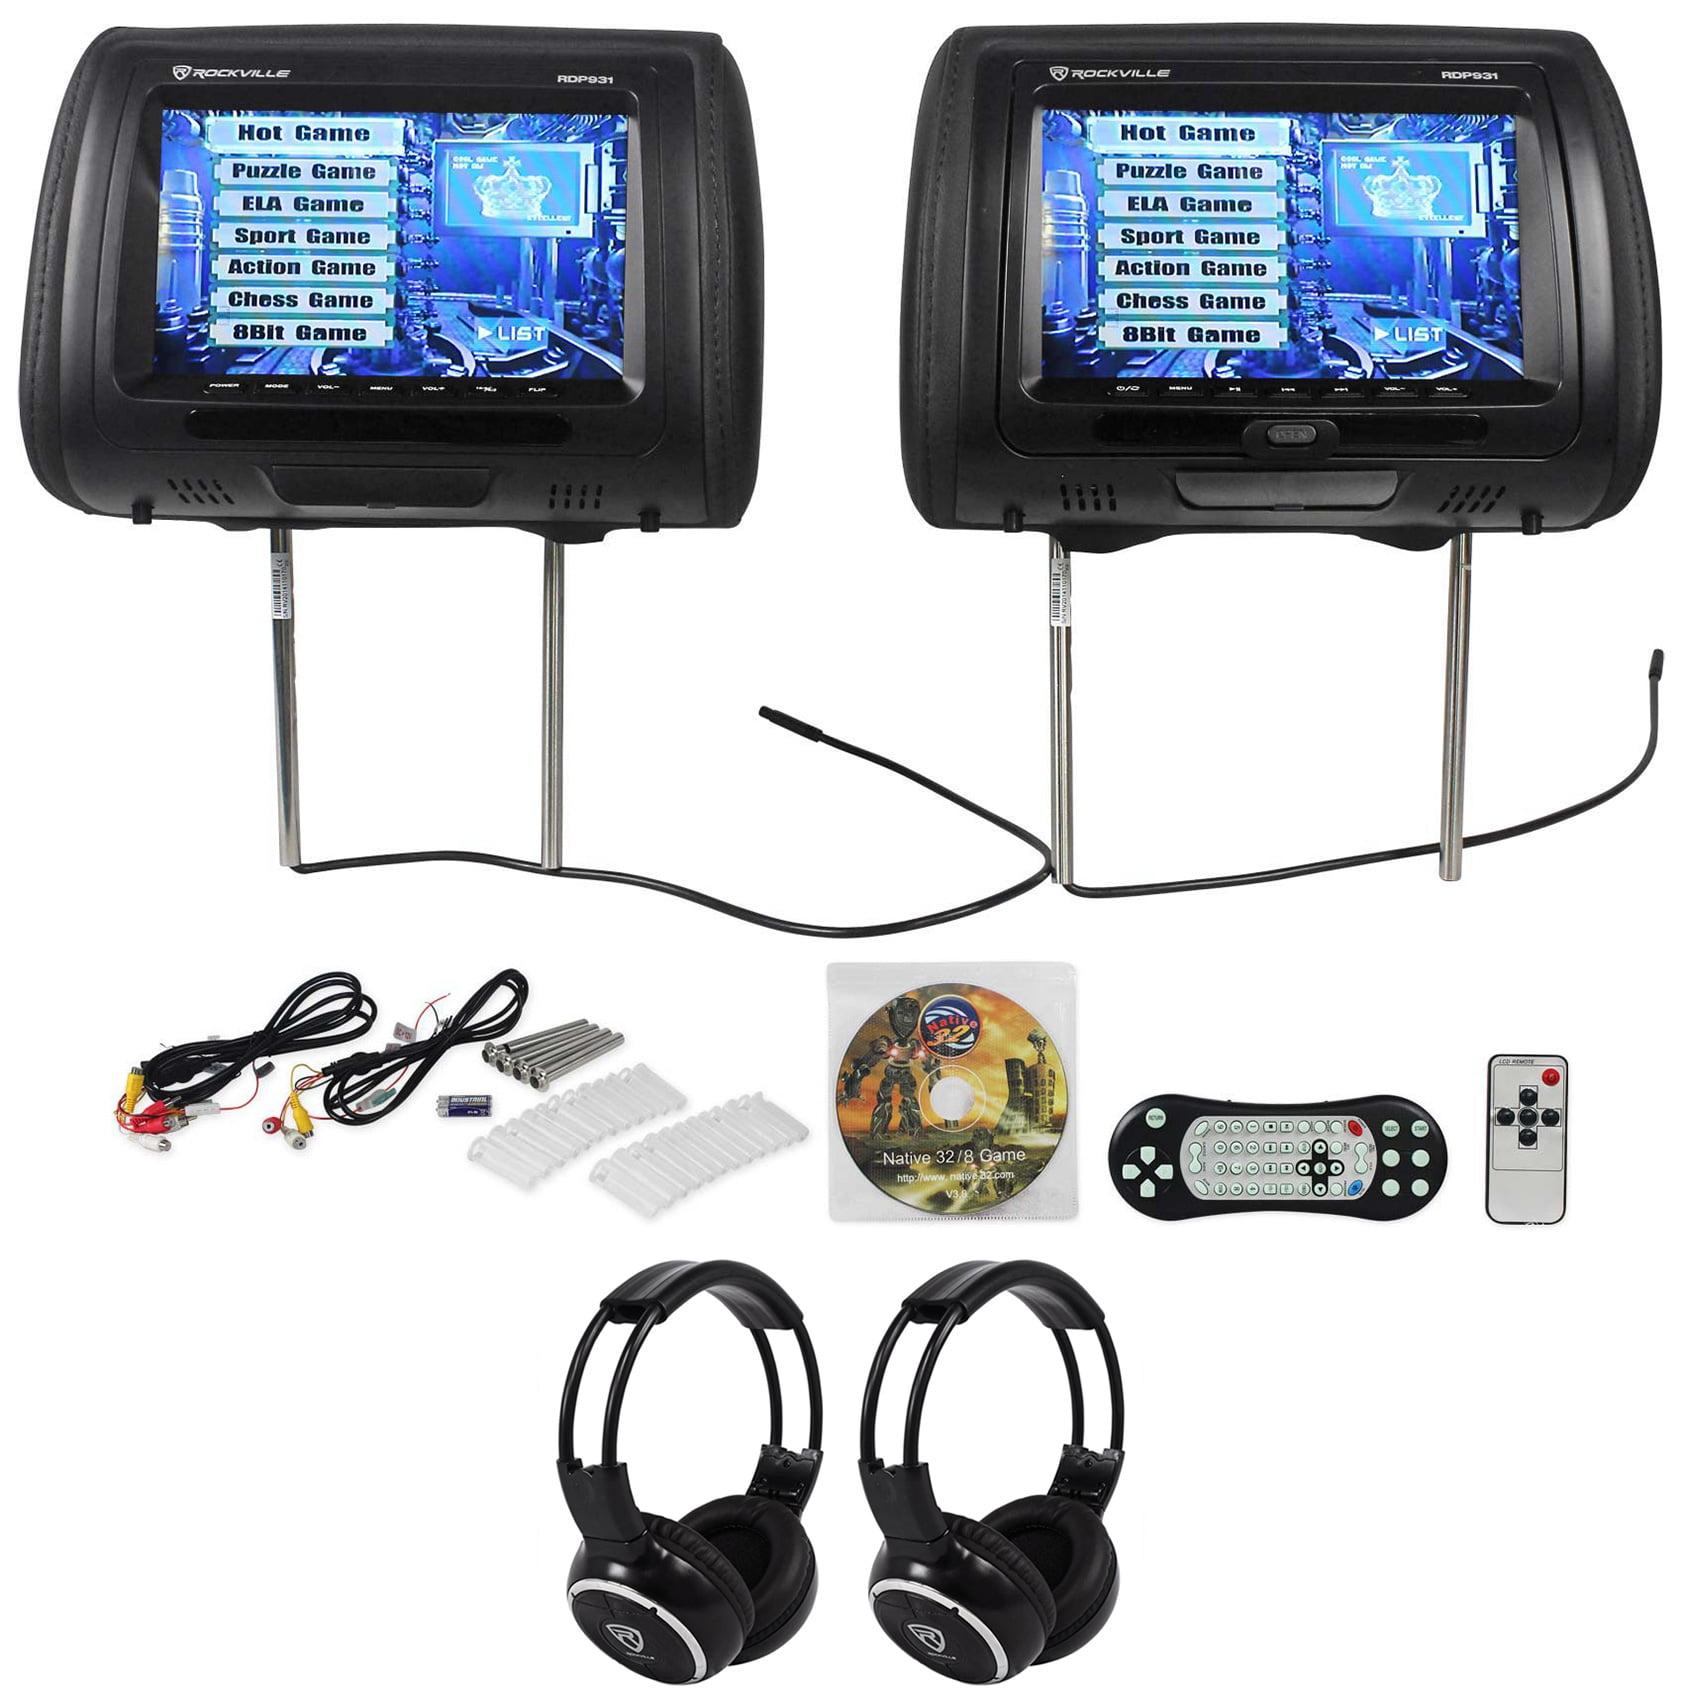 "Rockville RDP931-BK 9"" Black Car DVD/HDMI Headrest Monitors+2 Wireless Headsets"